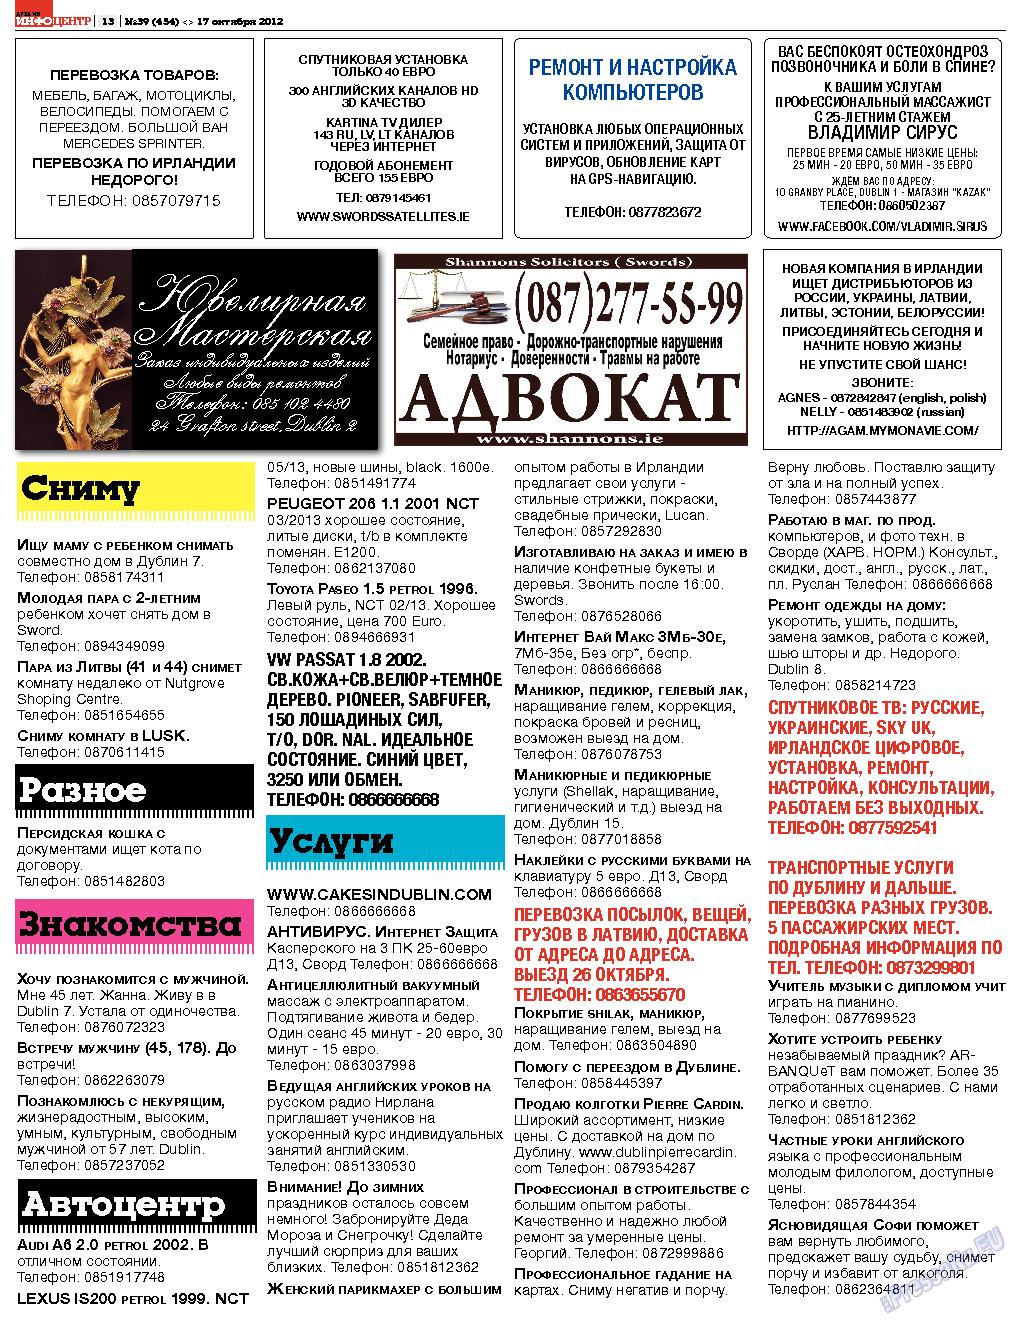 Дублин инфоцентр (газета). 2012 год, номер 38, стр. 13